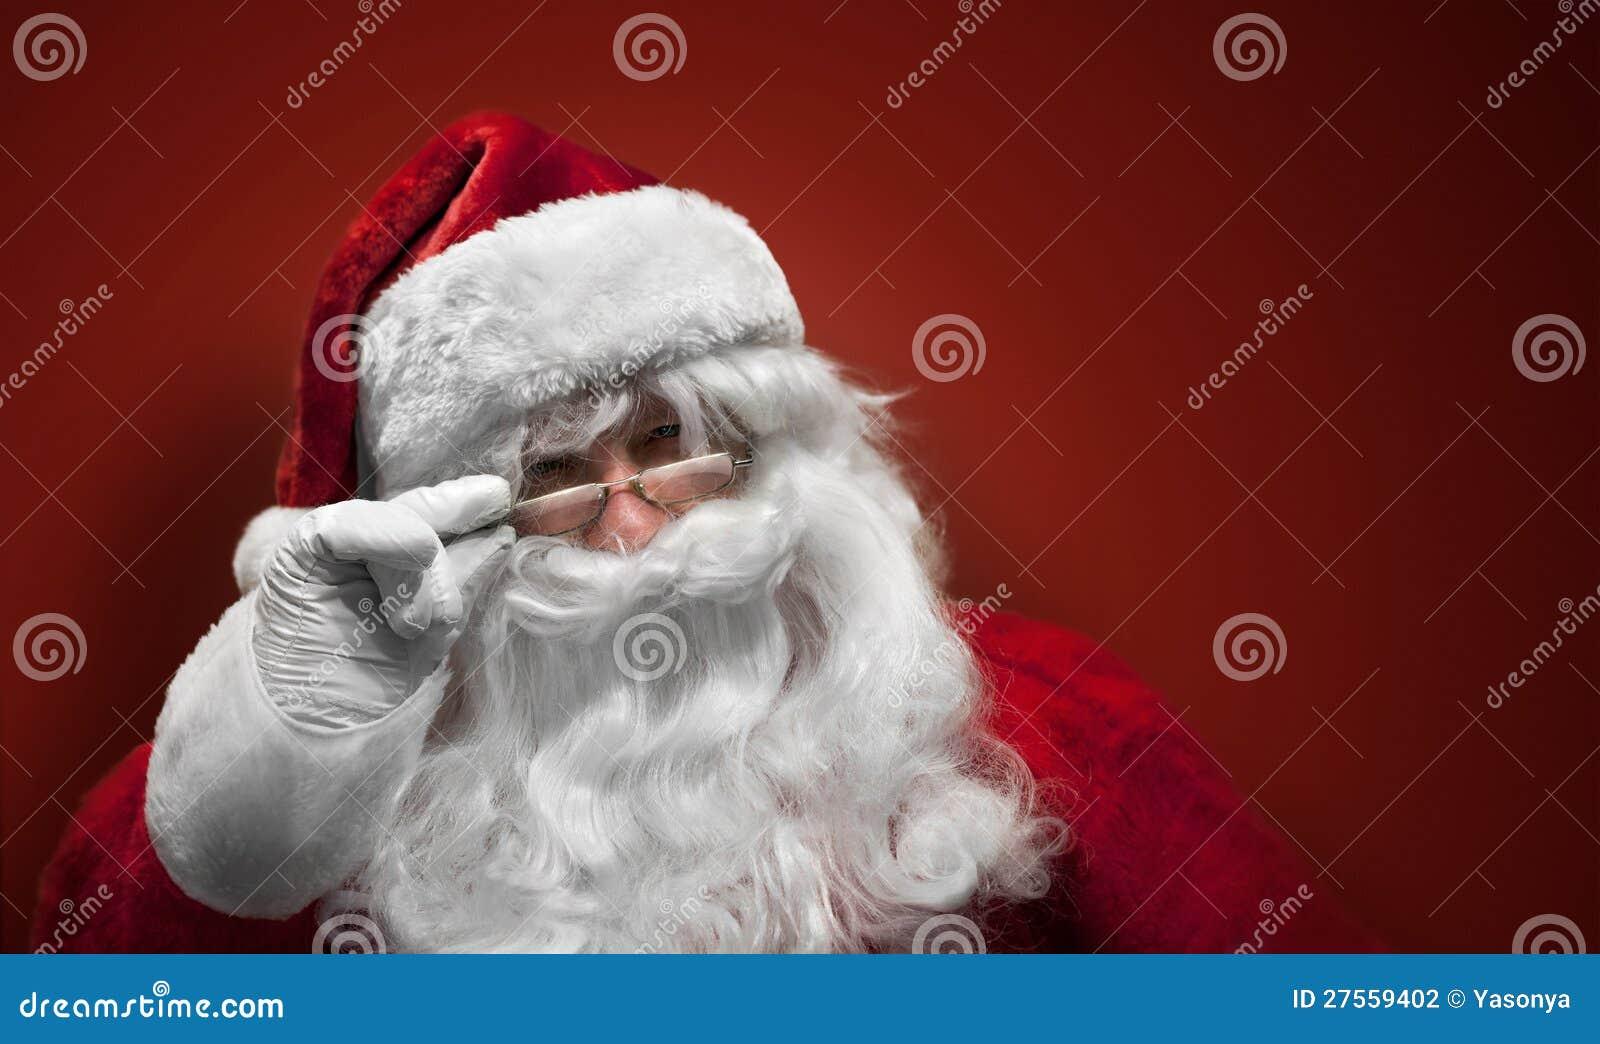 Santa Claus Smiling Face Stock Photography